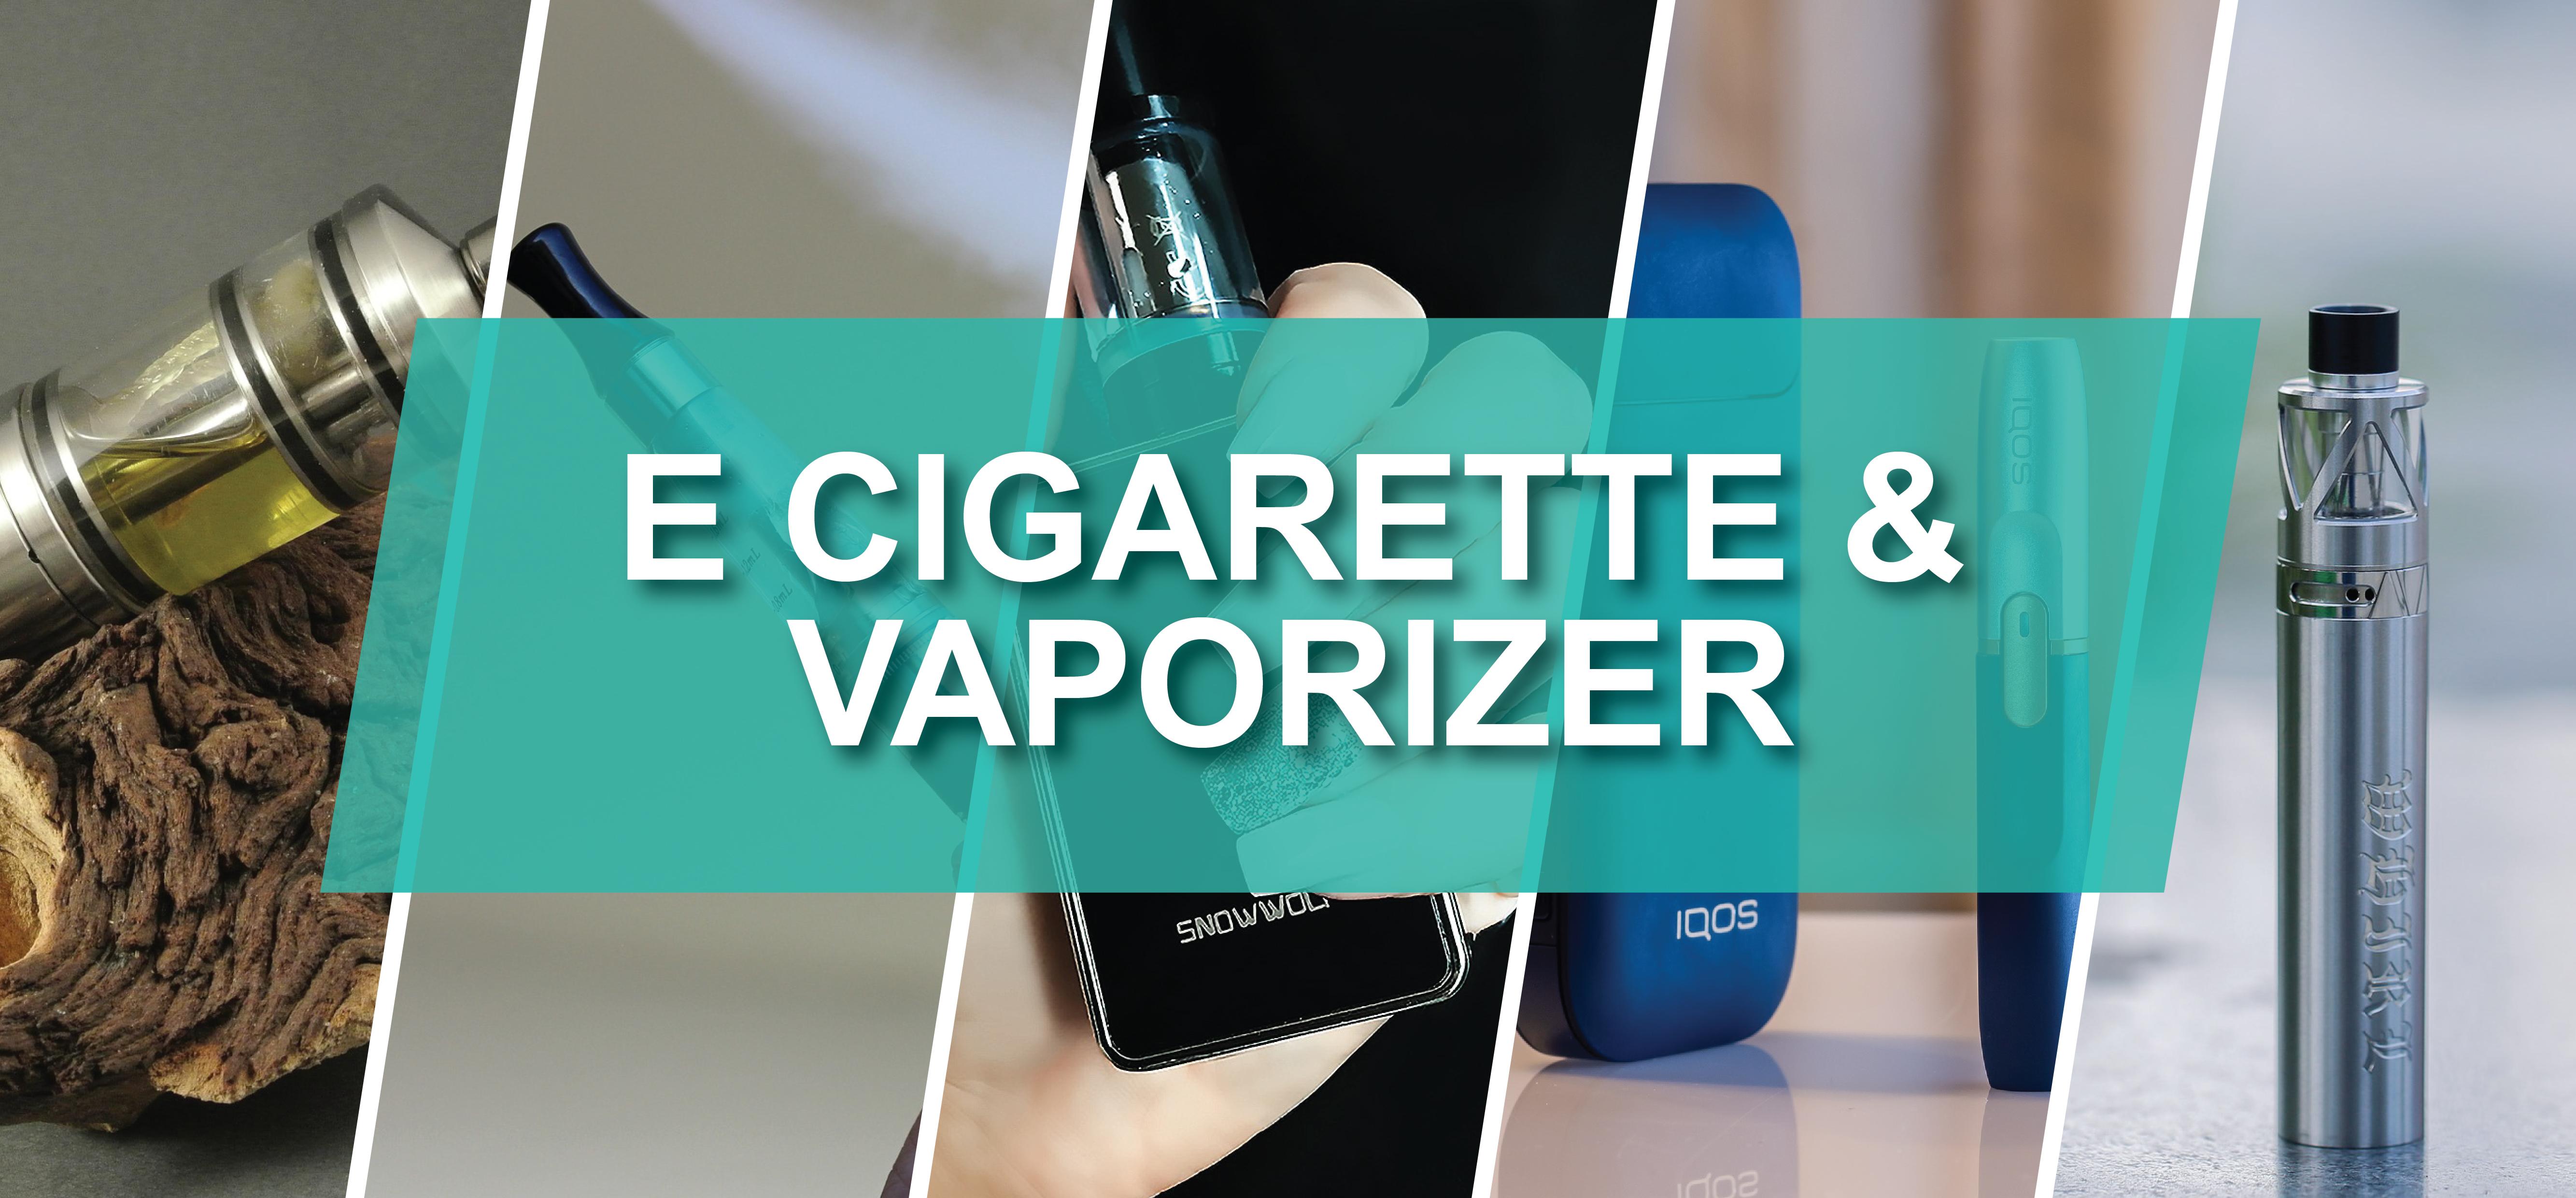 E Cigarette & Vaporizer Market